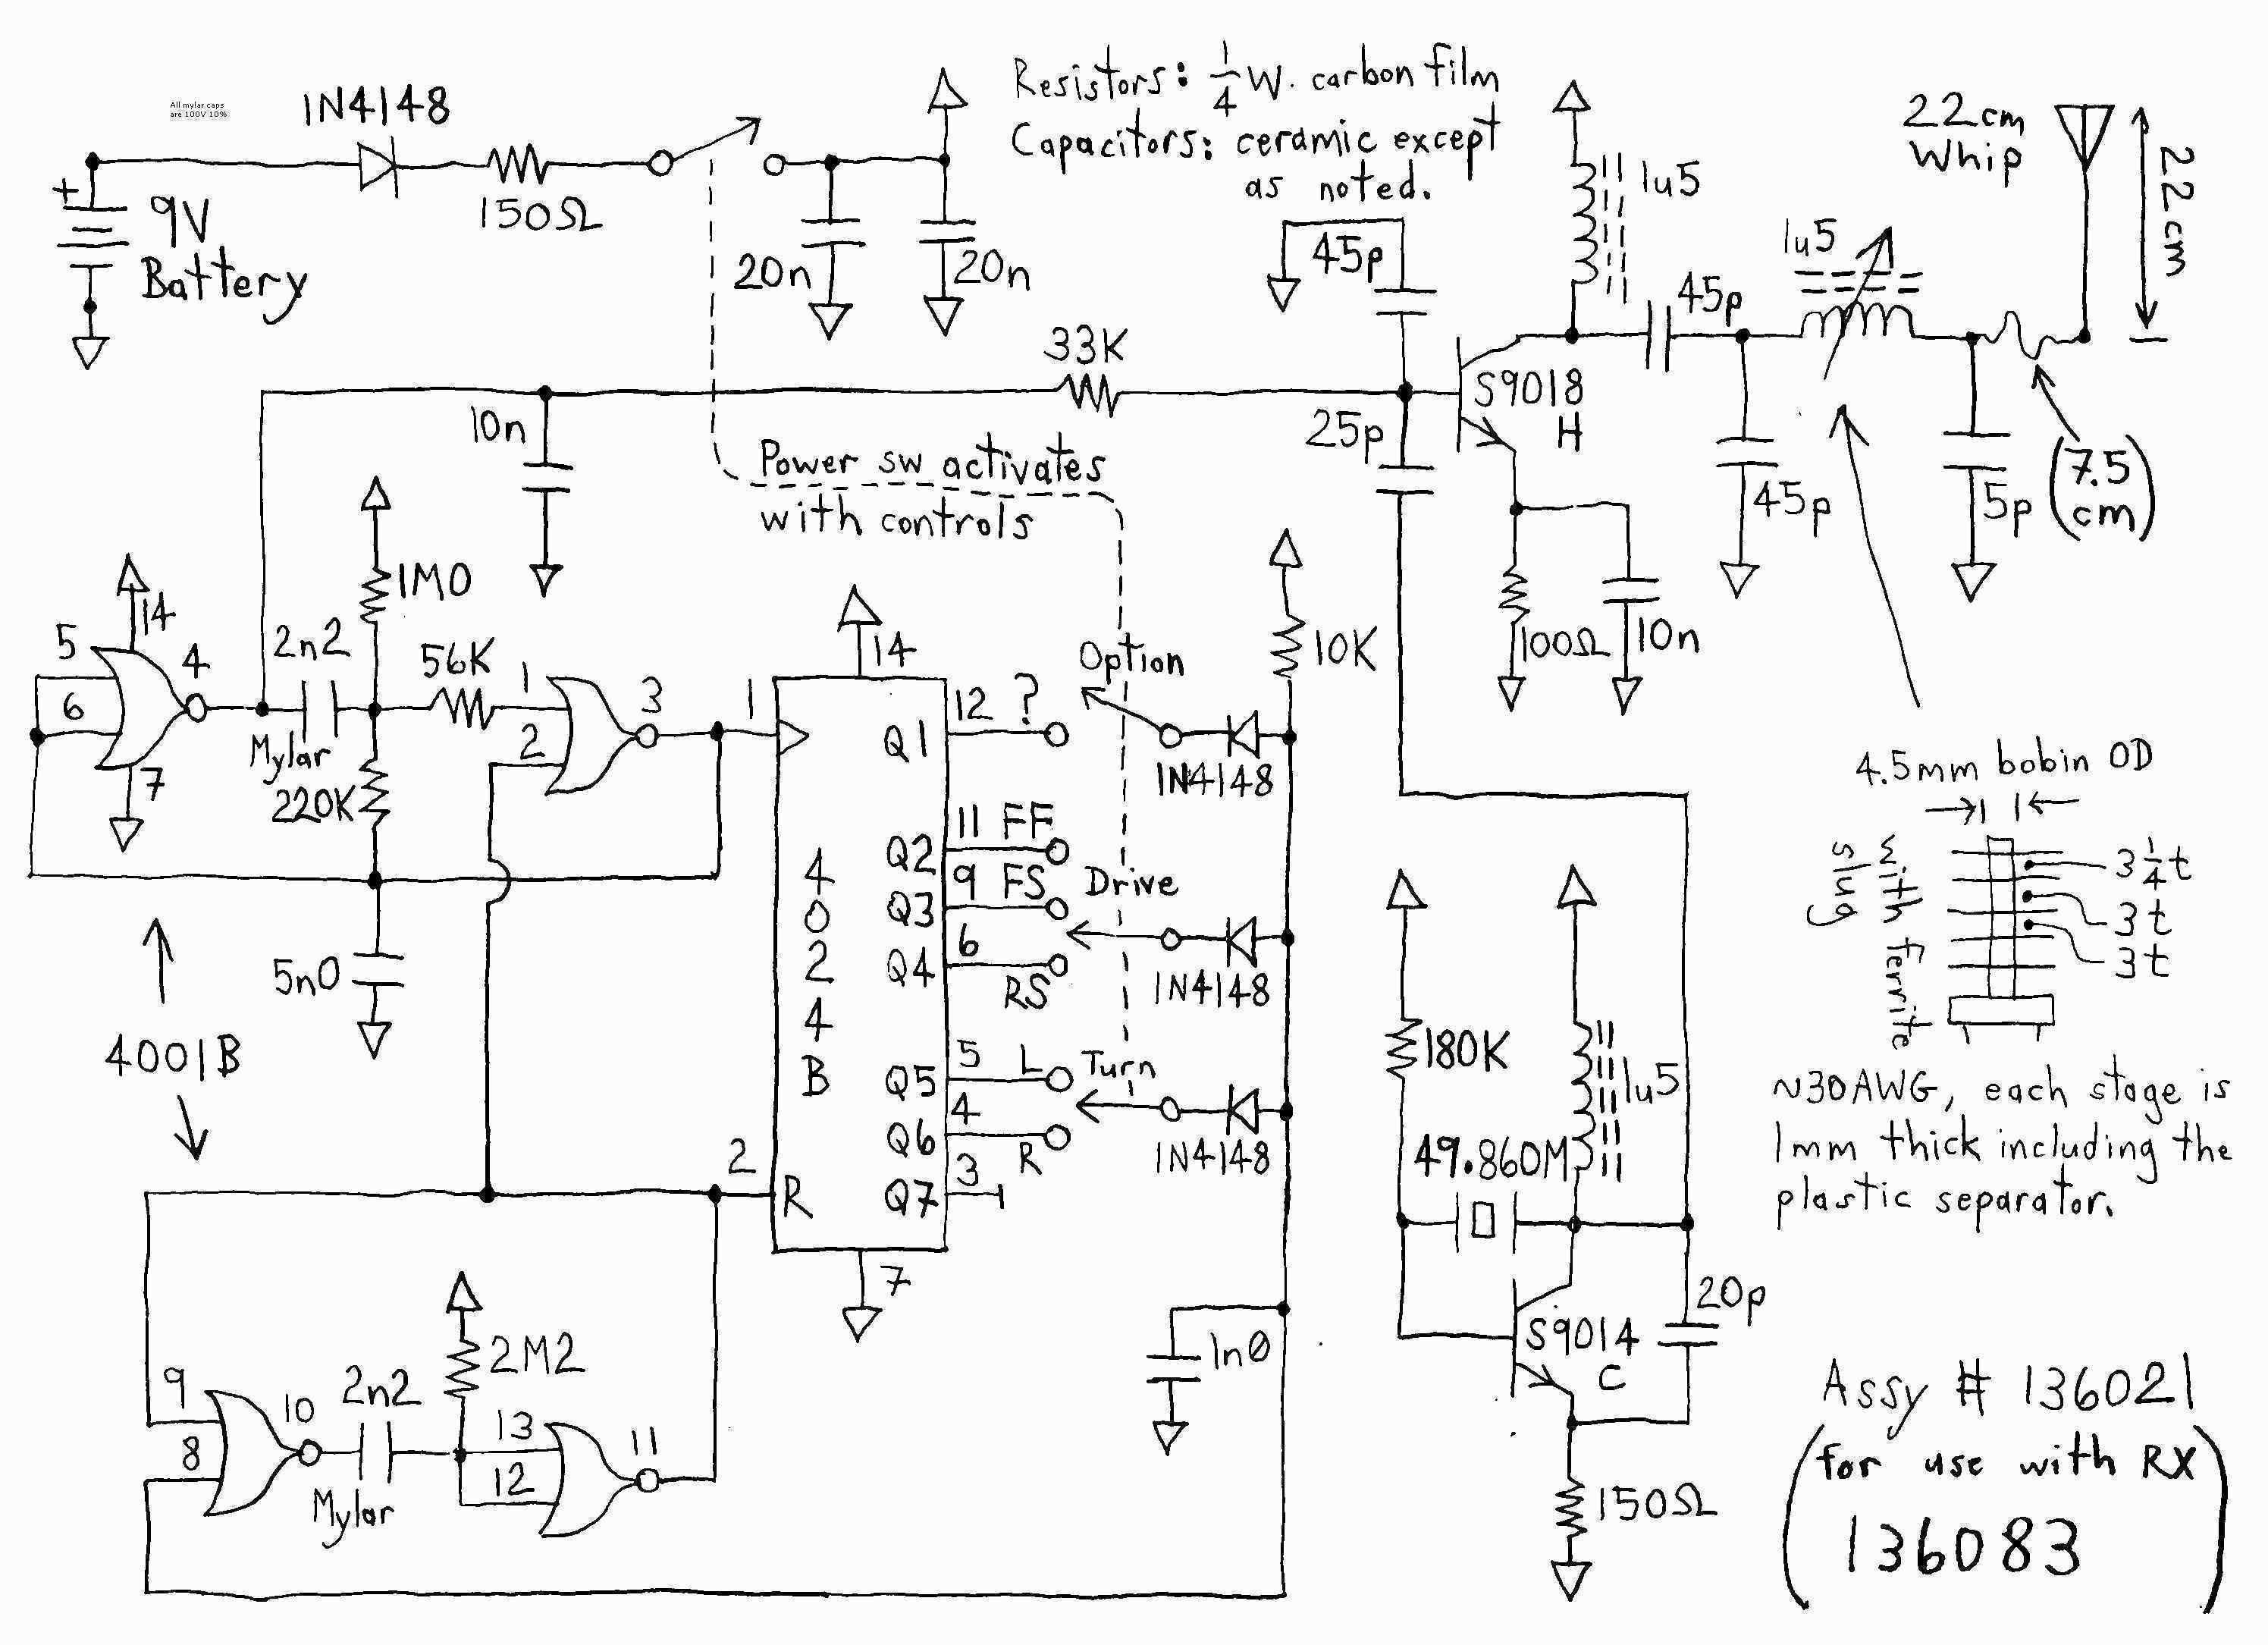 Process Flow Diagram Chemical Engineering Chemical Process Flow Diagram Symbols – Engineering Diagram Symbols Of Process Flow Diagram Chemical Engineering